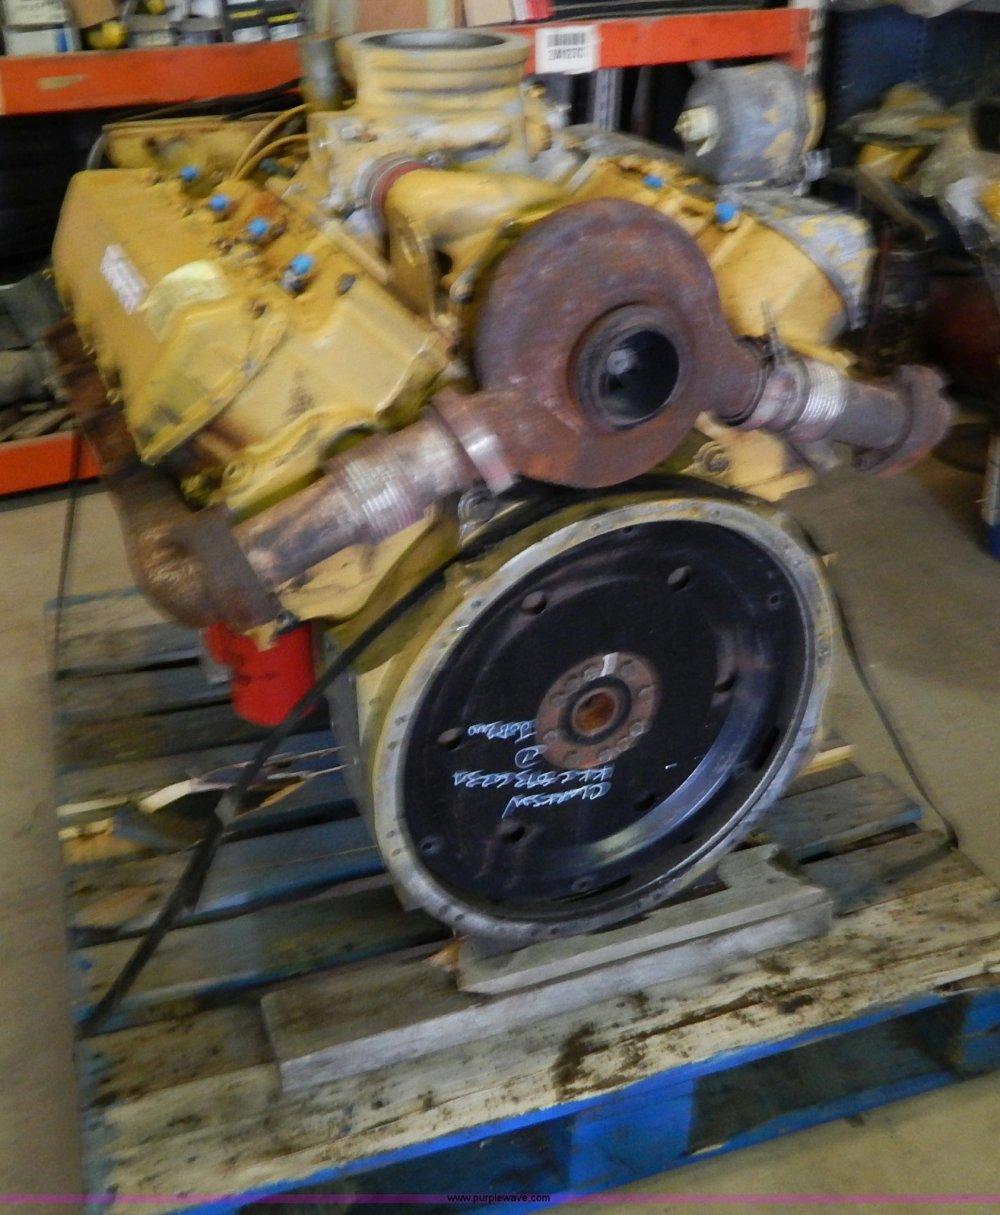 medium resolution of  caterpillar 3208 turbo diesel engine full size in new window